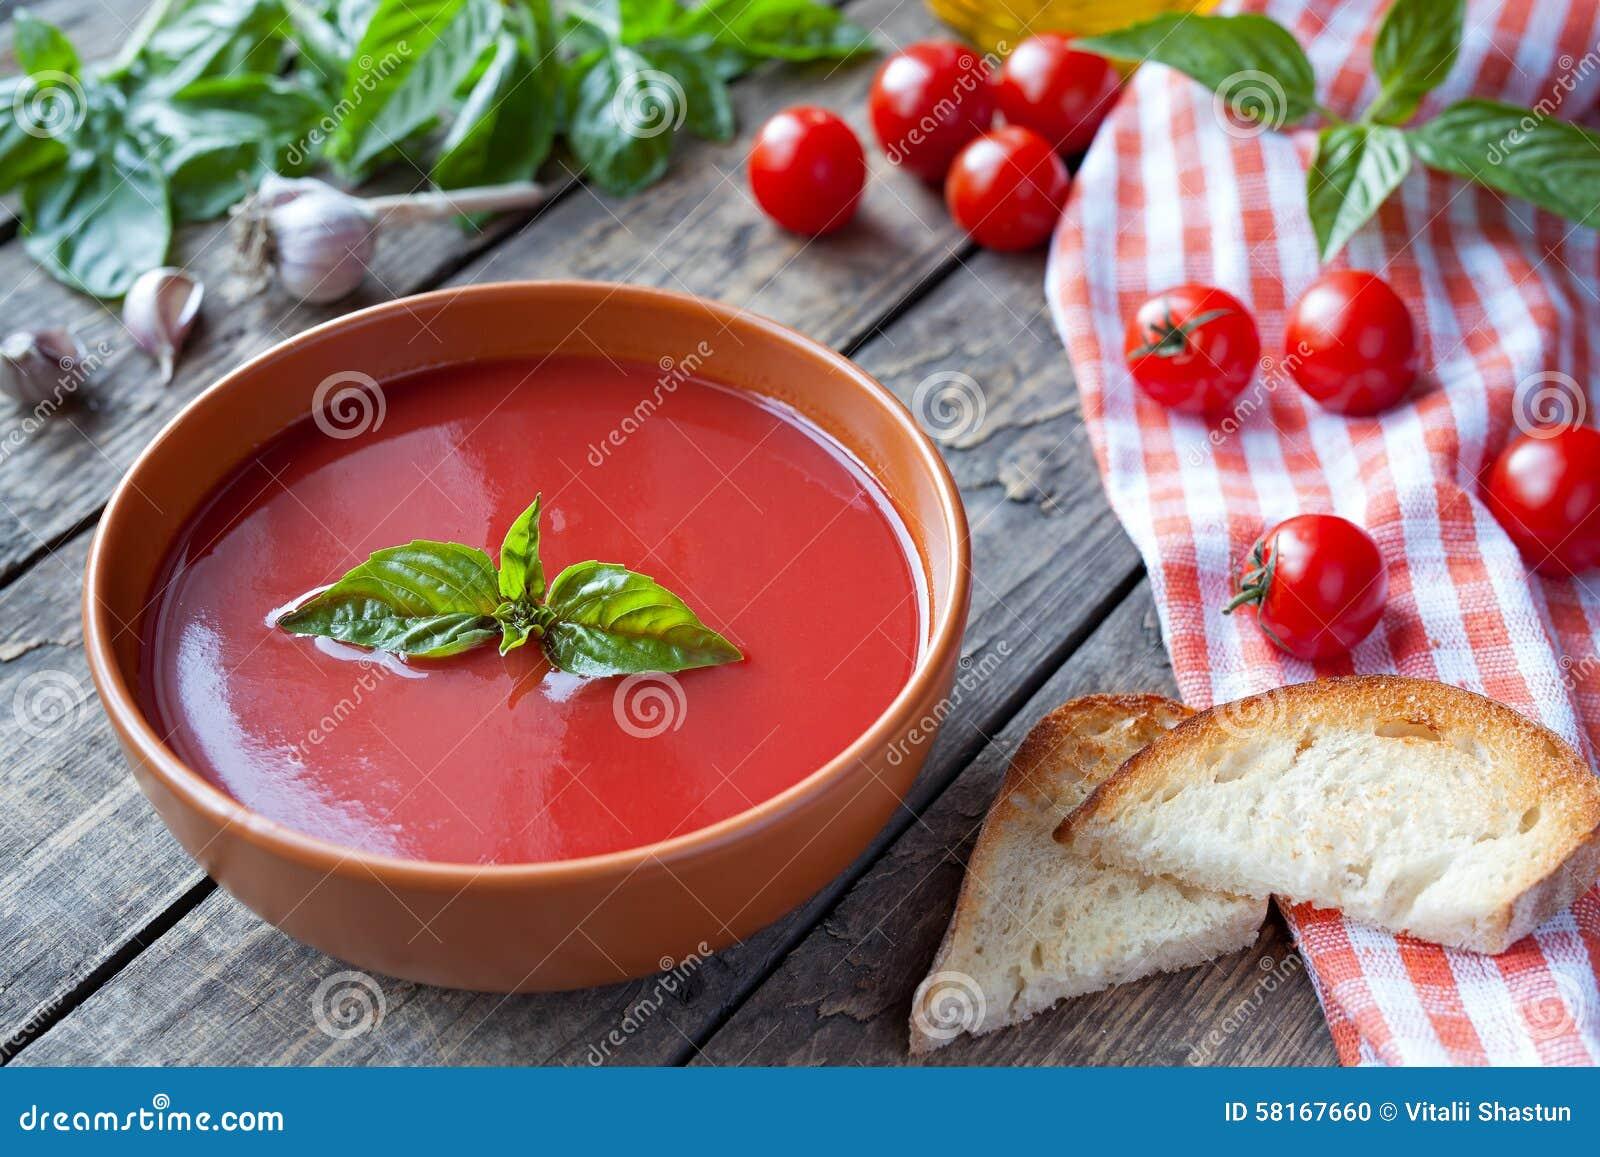 Healhy Vegetarian Traditional Italian Tomato Soup Stock Photo - Image ...